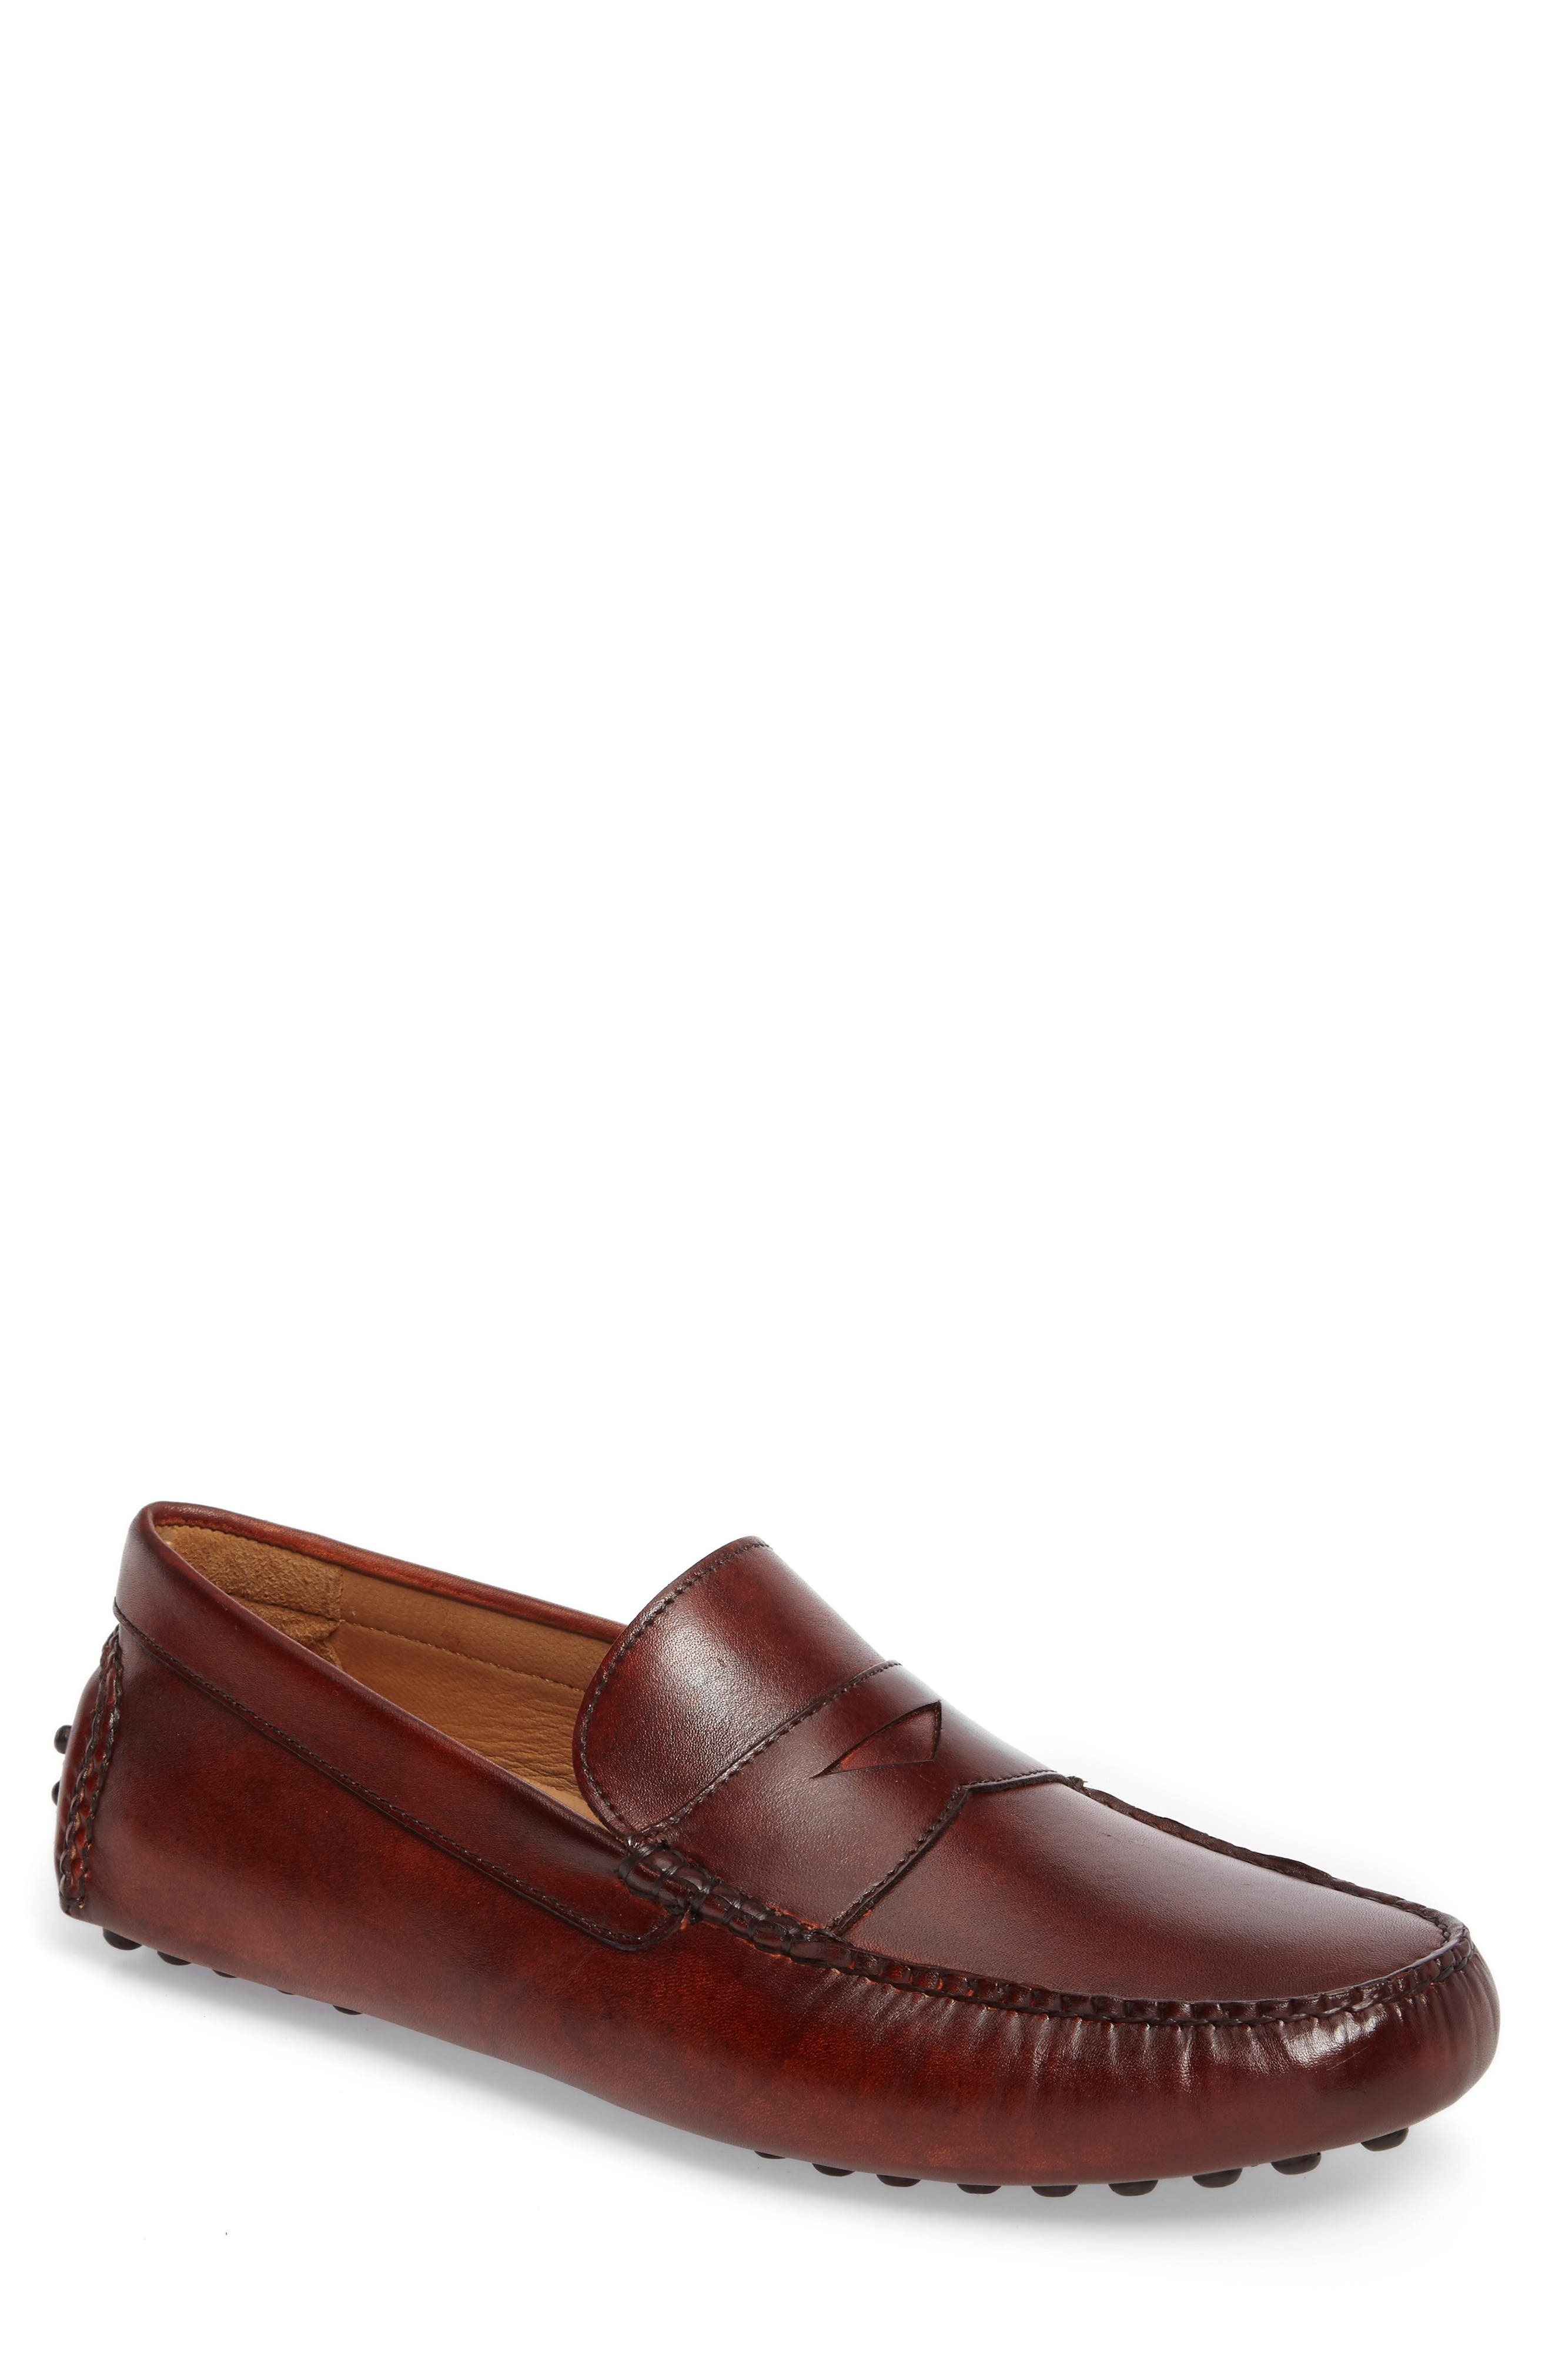 John W. Nordstrom® Eaton Driving Shoe (Men)